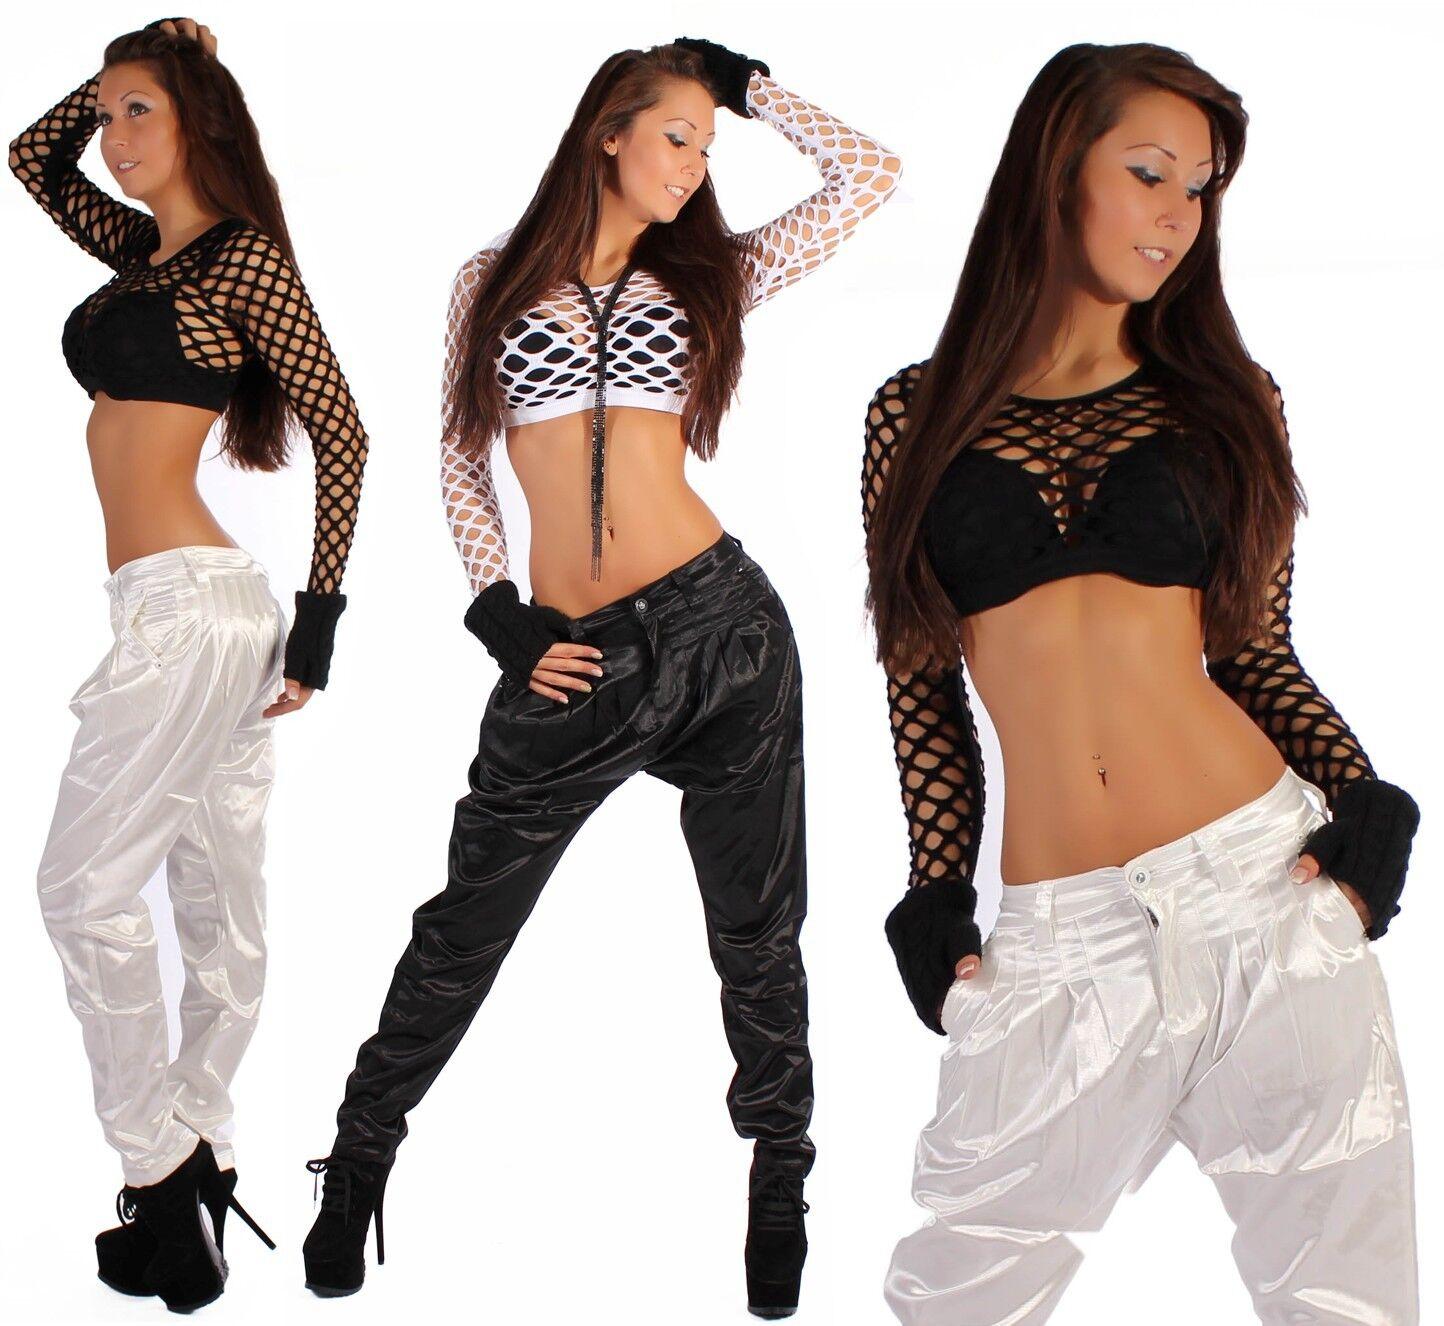 sw12 women pants chino trousers chino boyfriend harem. Black Bedroom Furniture Sets. Home Design Ideas